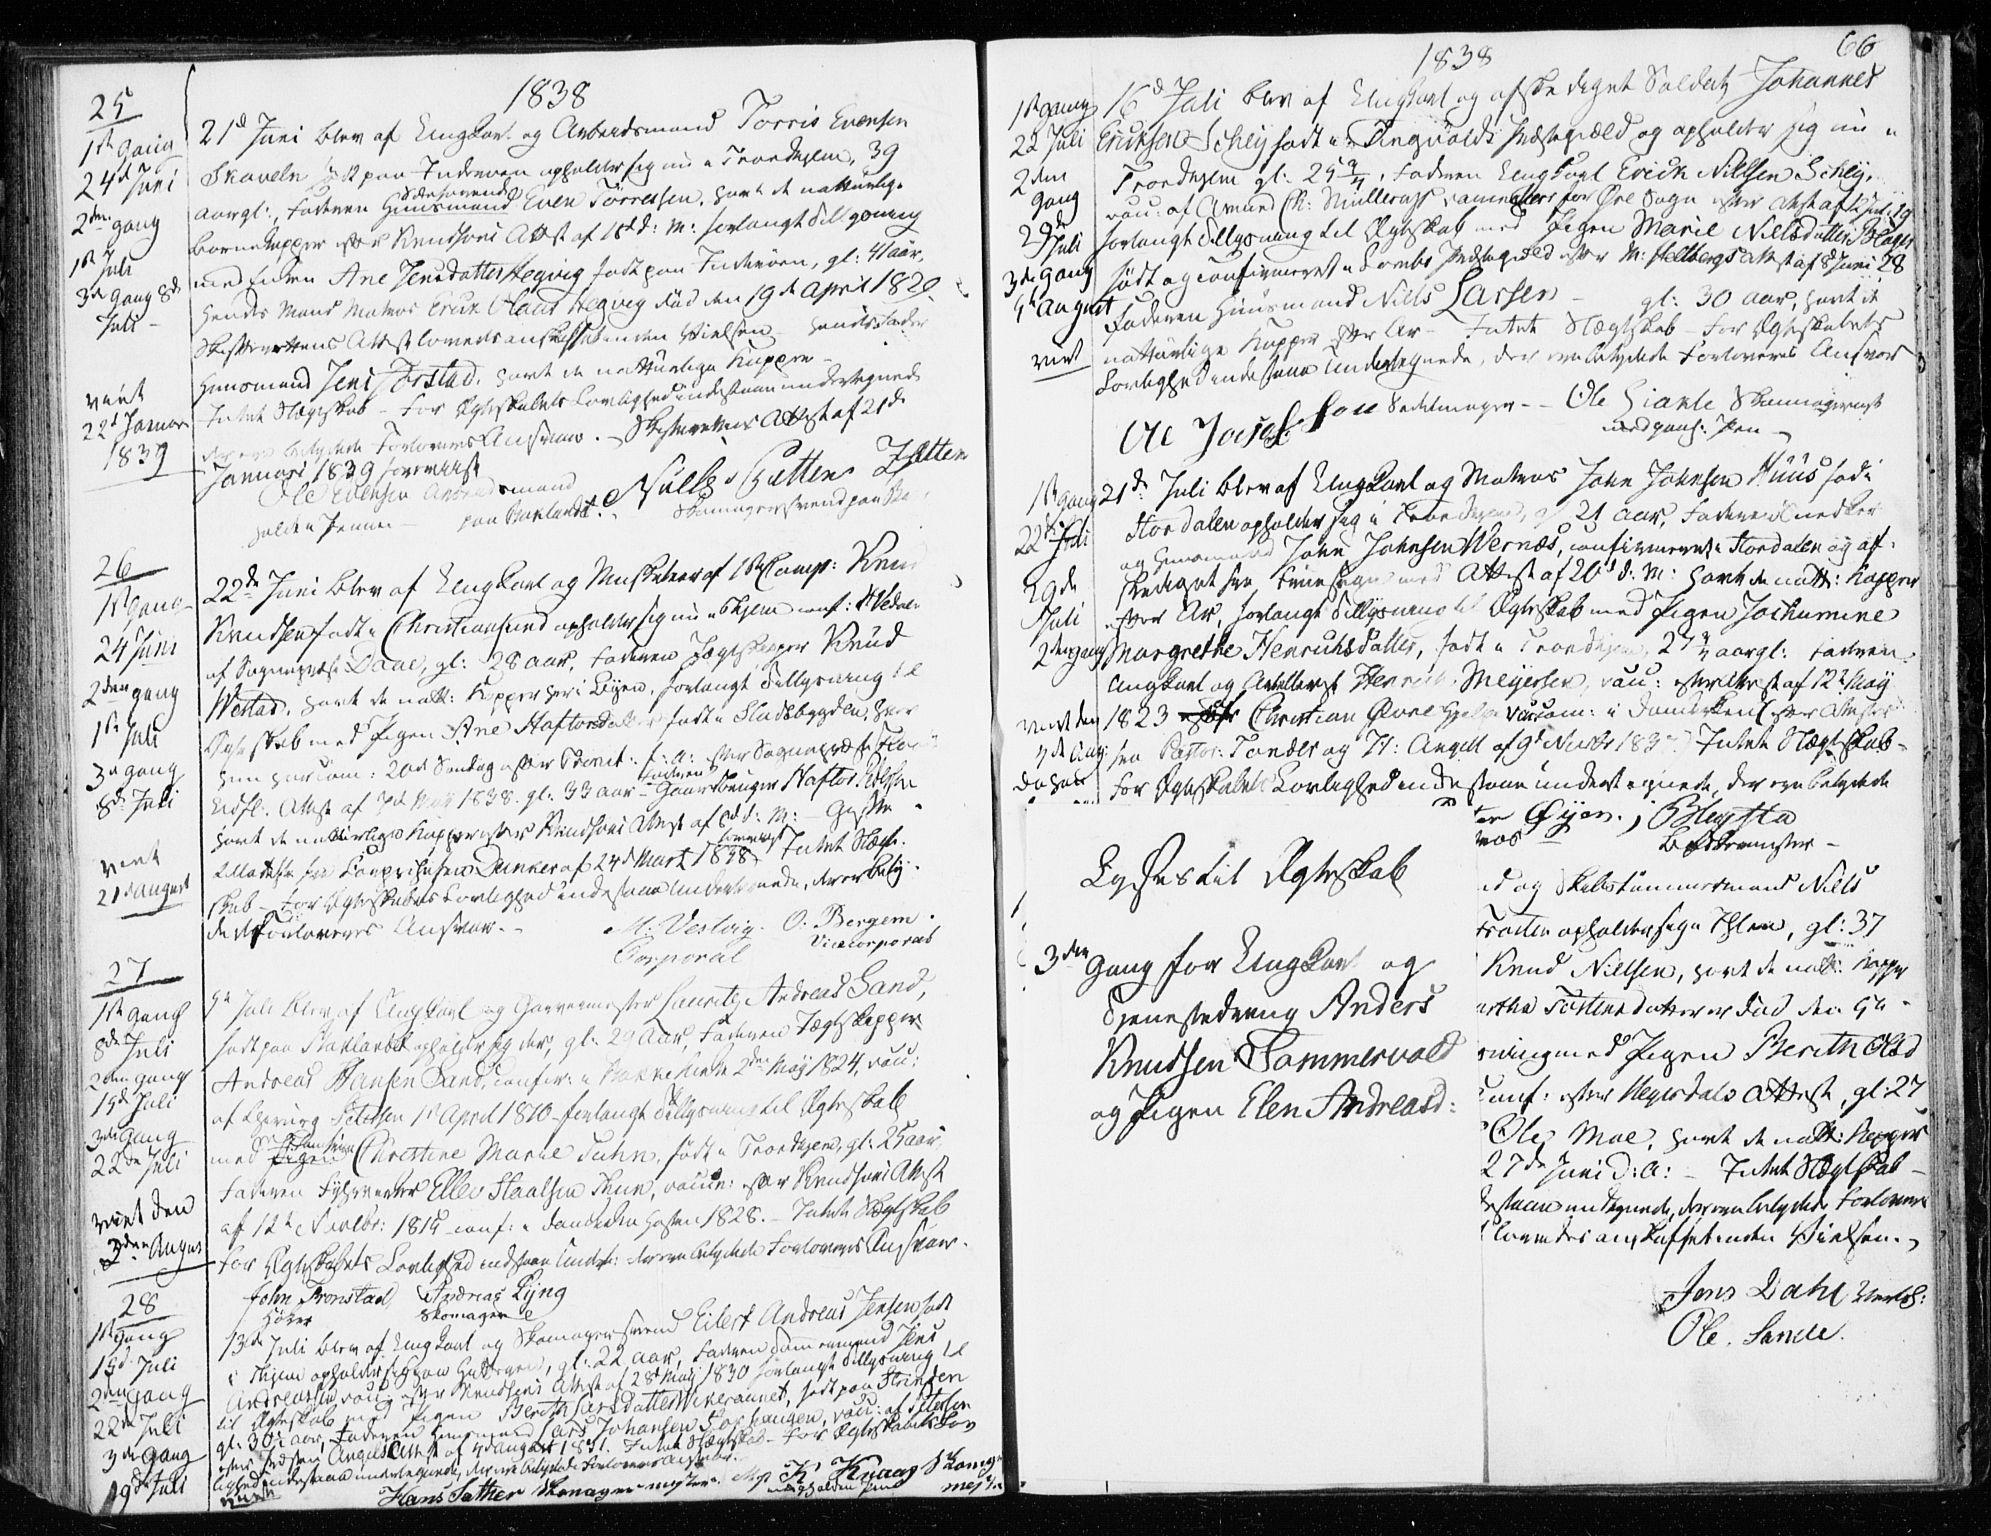 SAT, Ministerialprotokoller, klokkerbøker og fødselsregistre - Sør-Trøndelag, 601/L0046: Parish register (official) no. 601A14, 1830-1841, p. 66